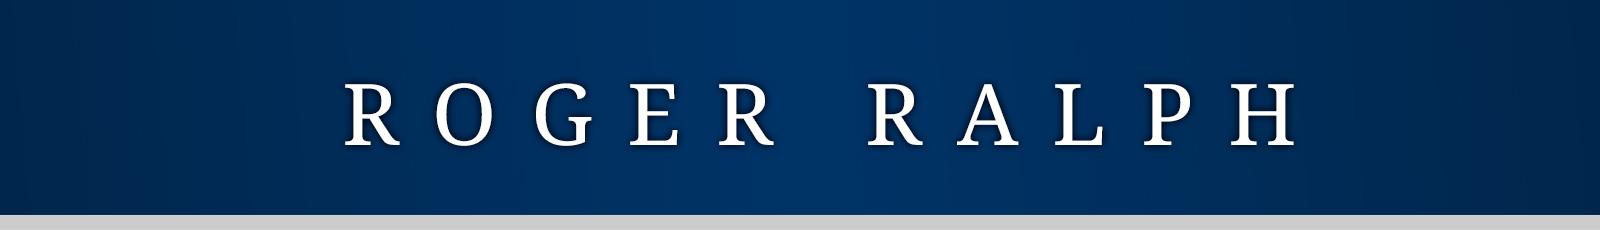 Roger Ralph